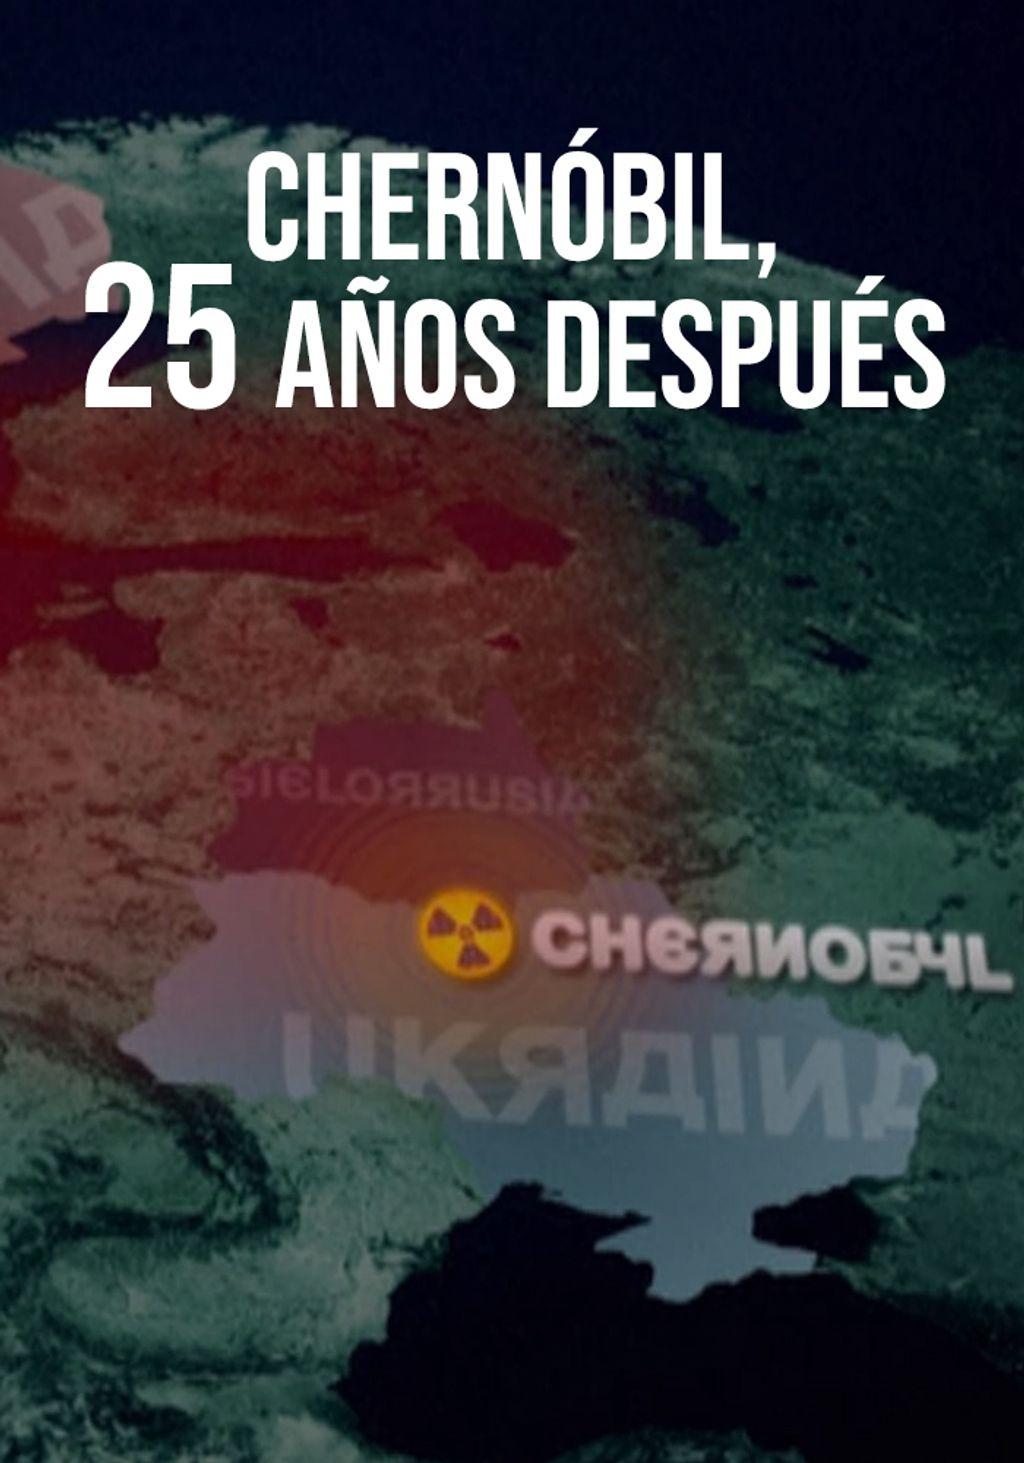 chernobil25despues